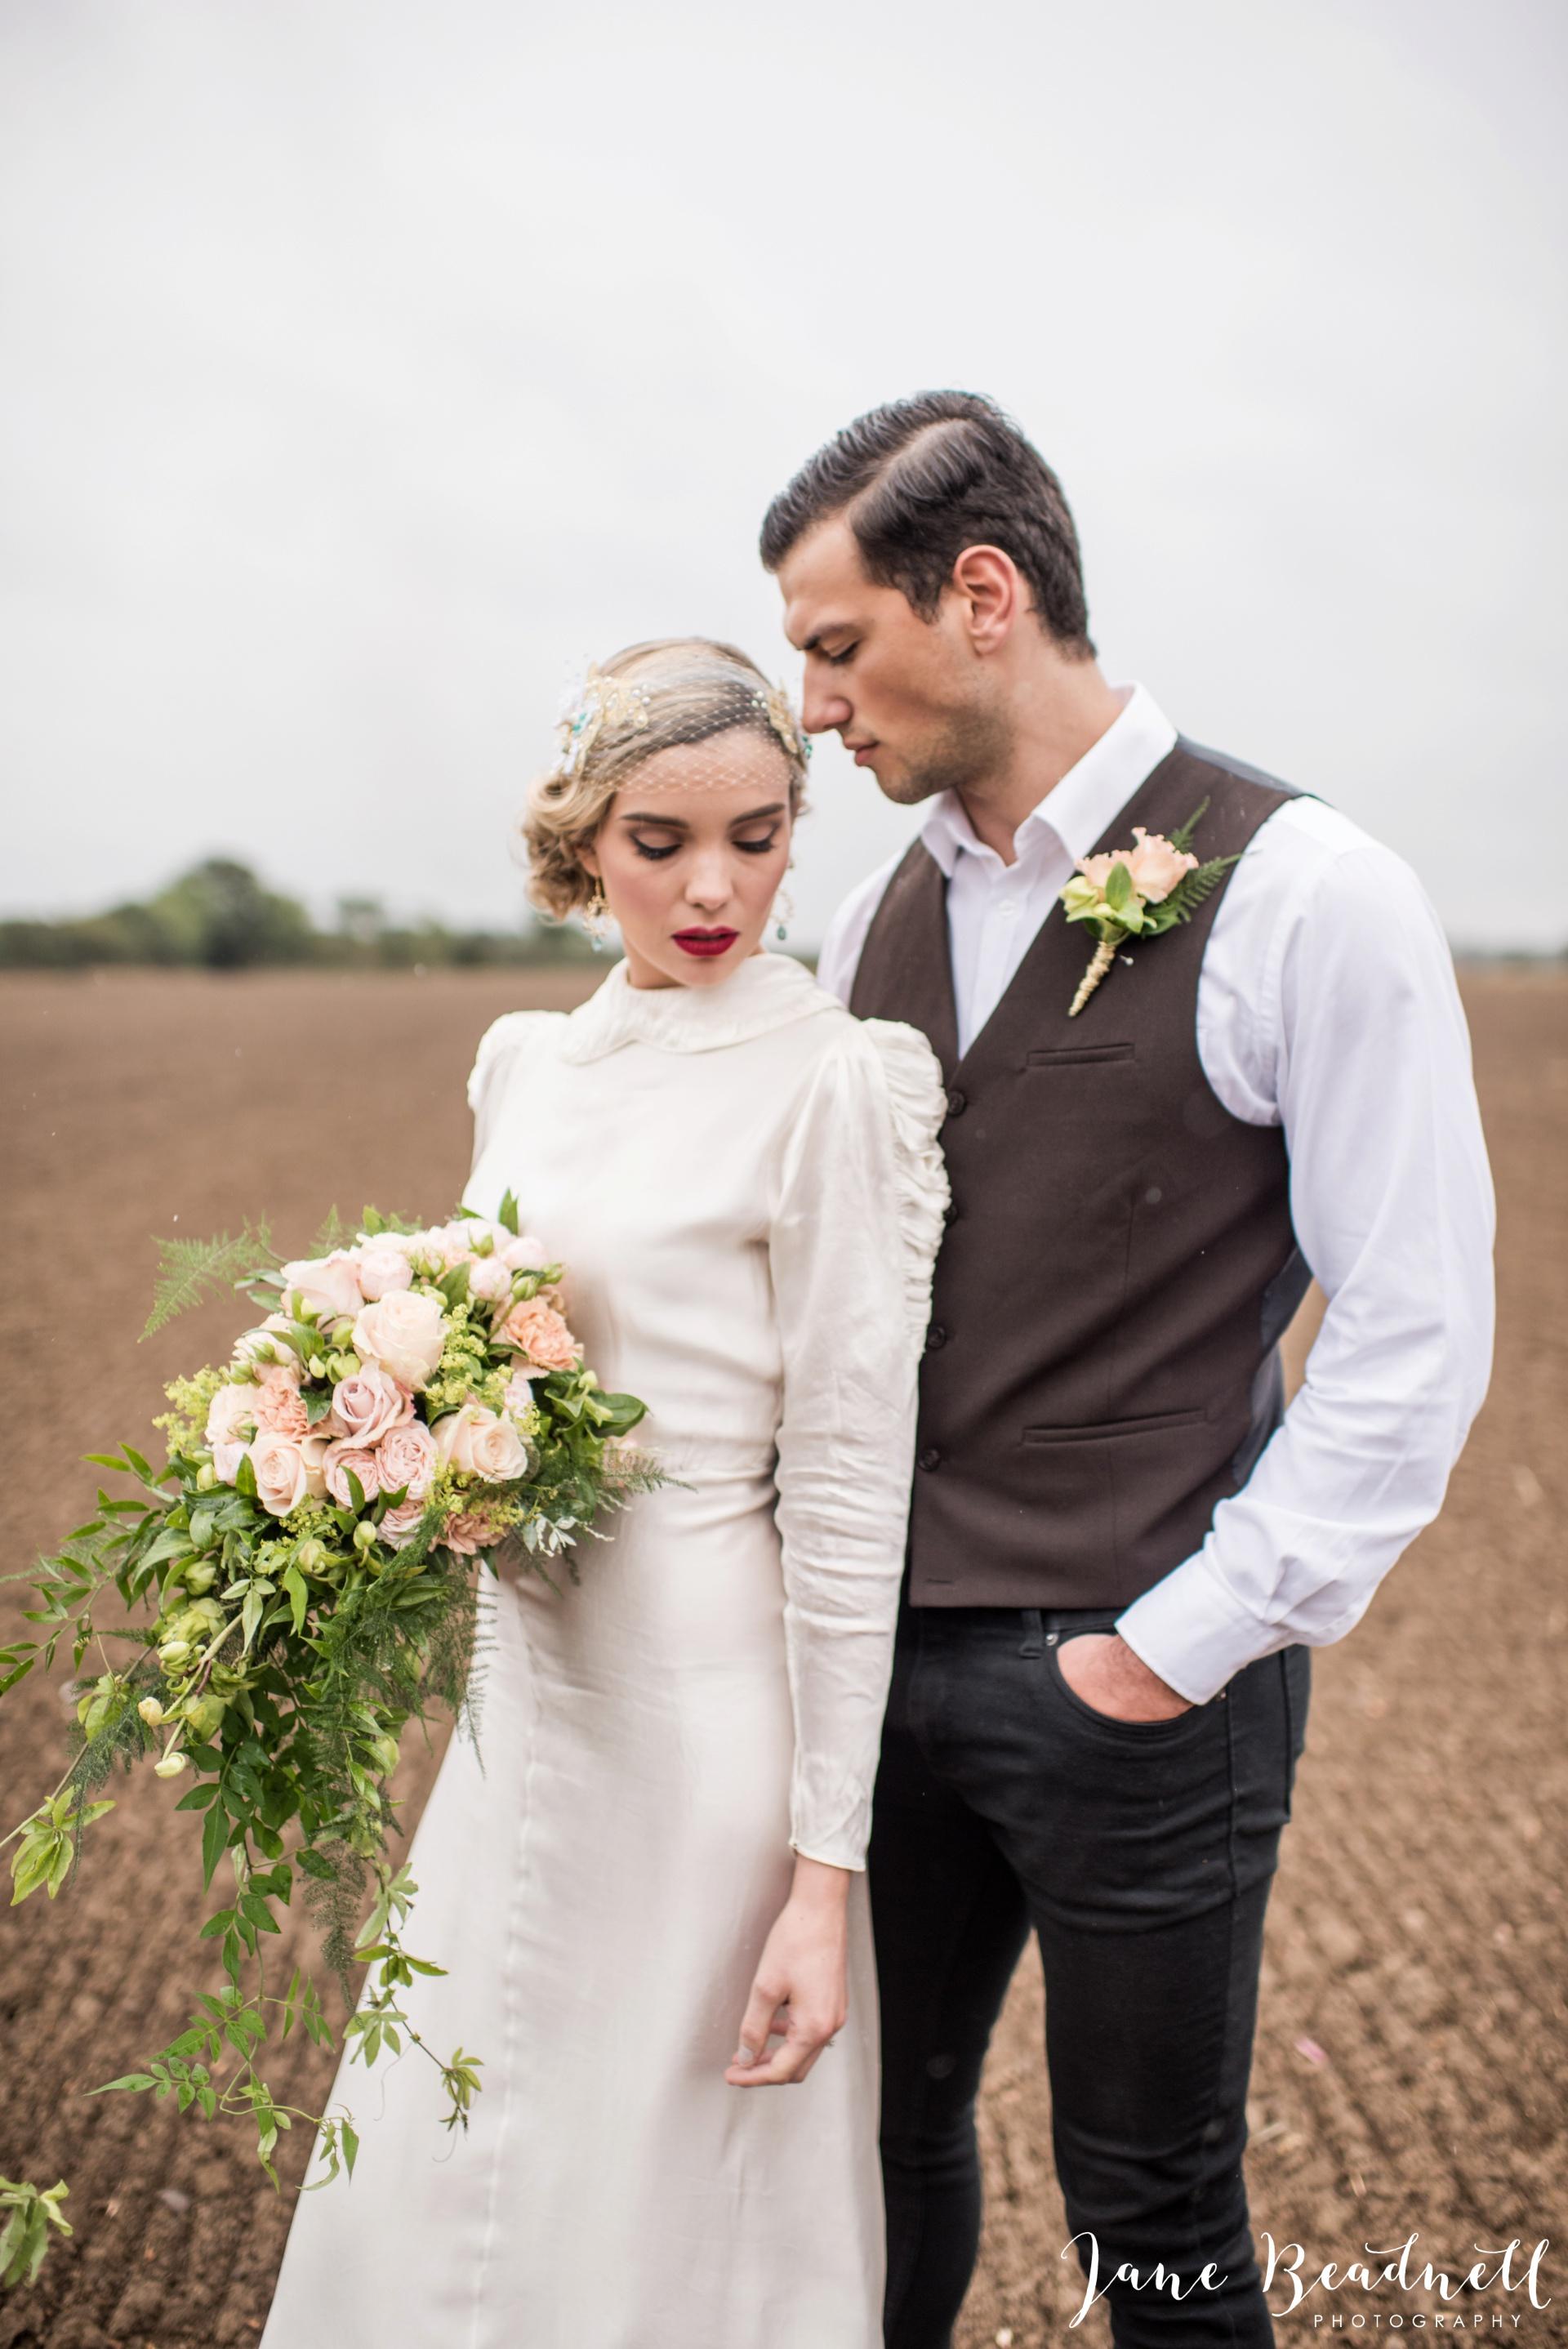 fine-art-wedding-photographer-jane-beadnell-photography_0014